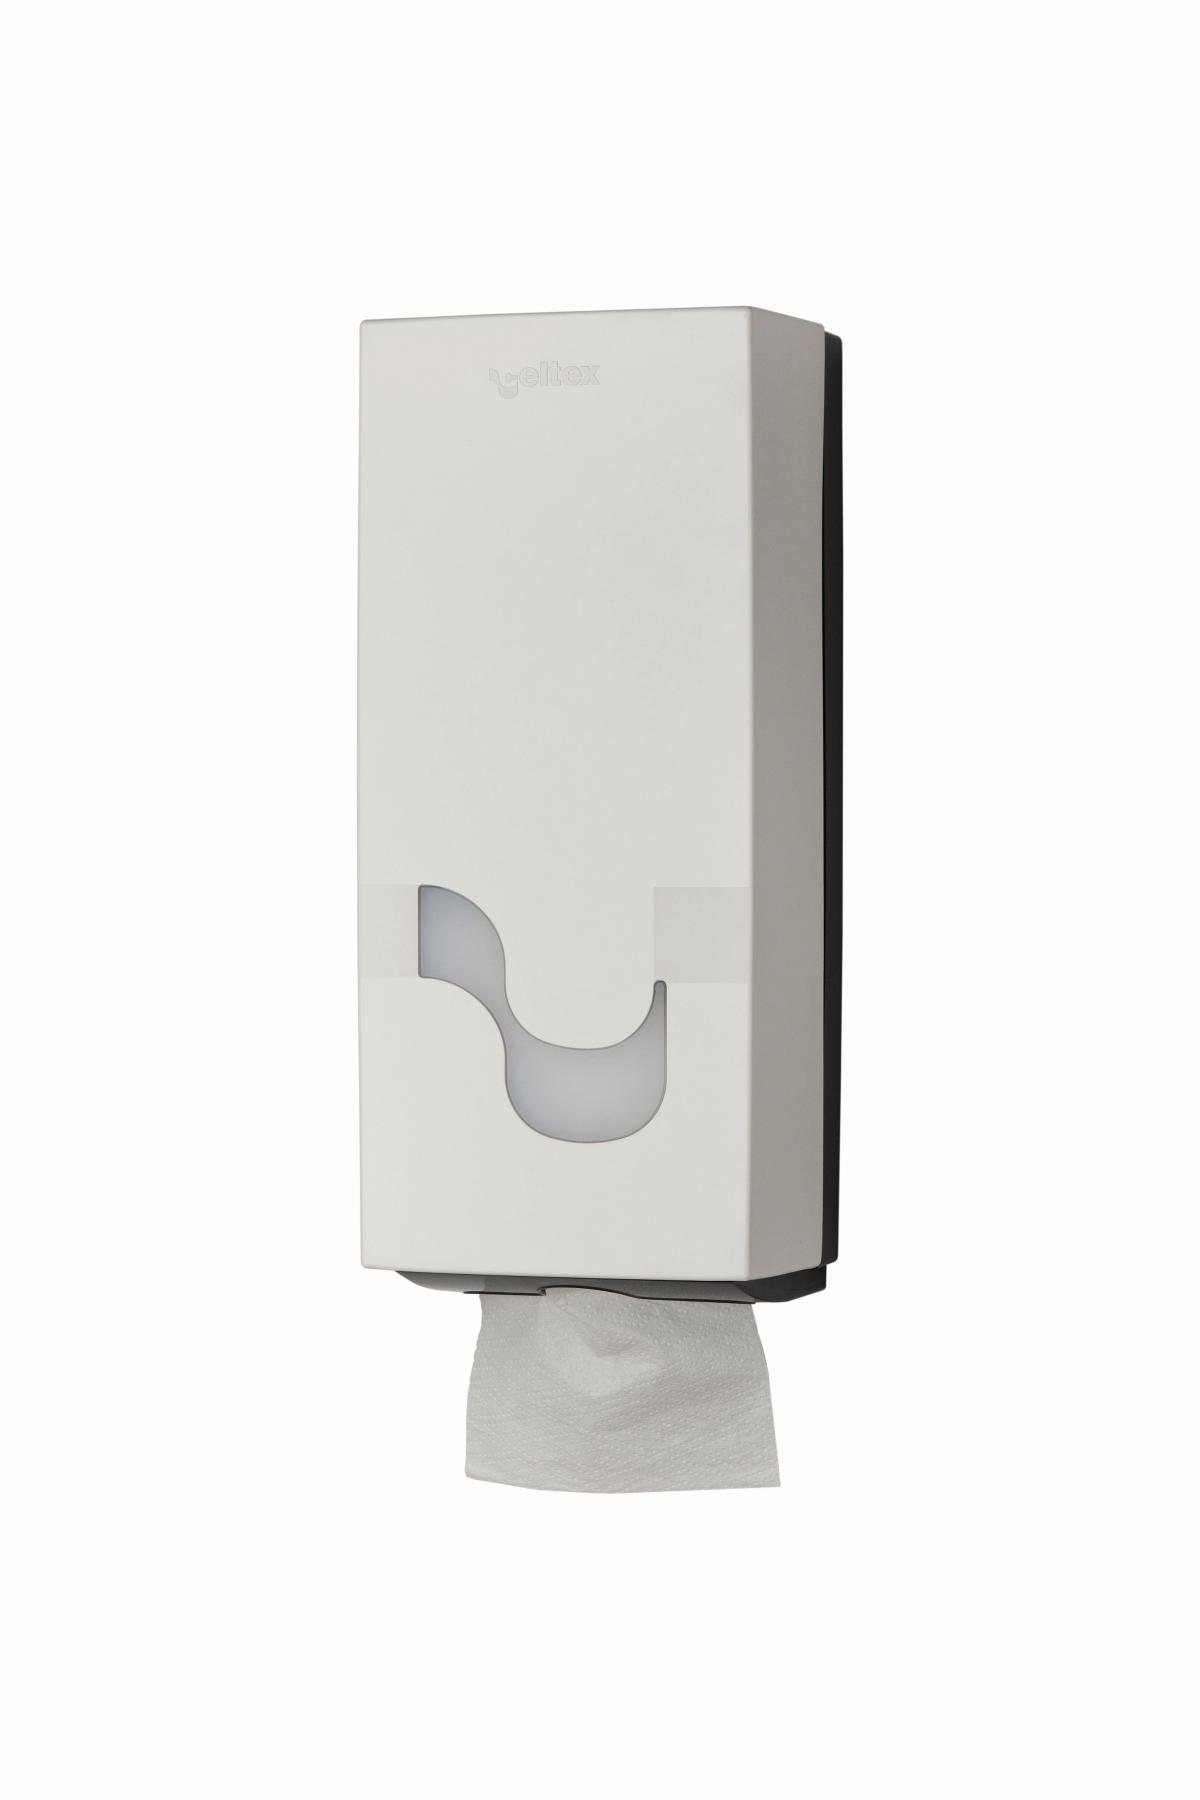 Toilettenpapierspender intop weiß